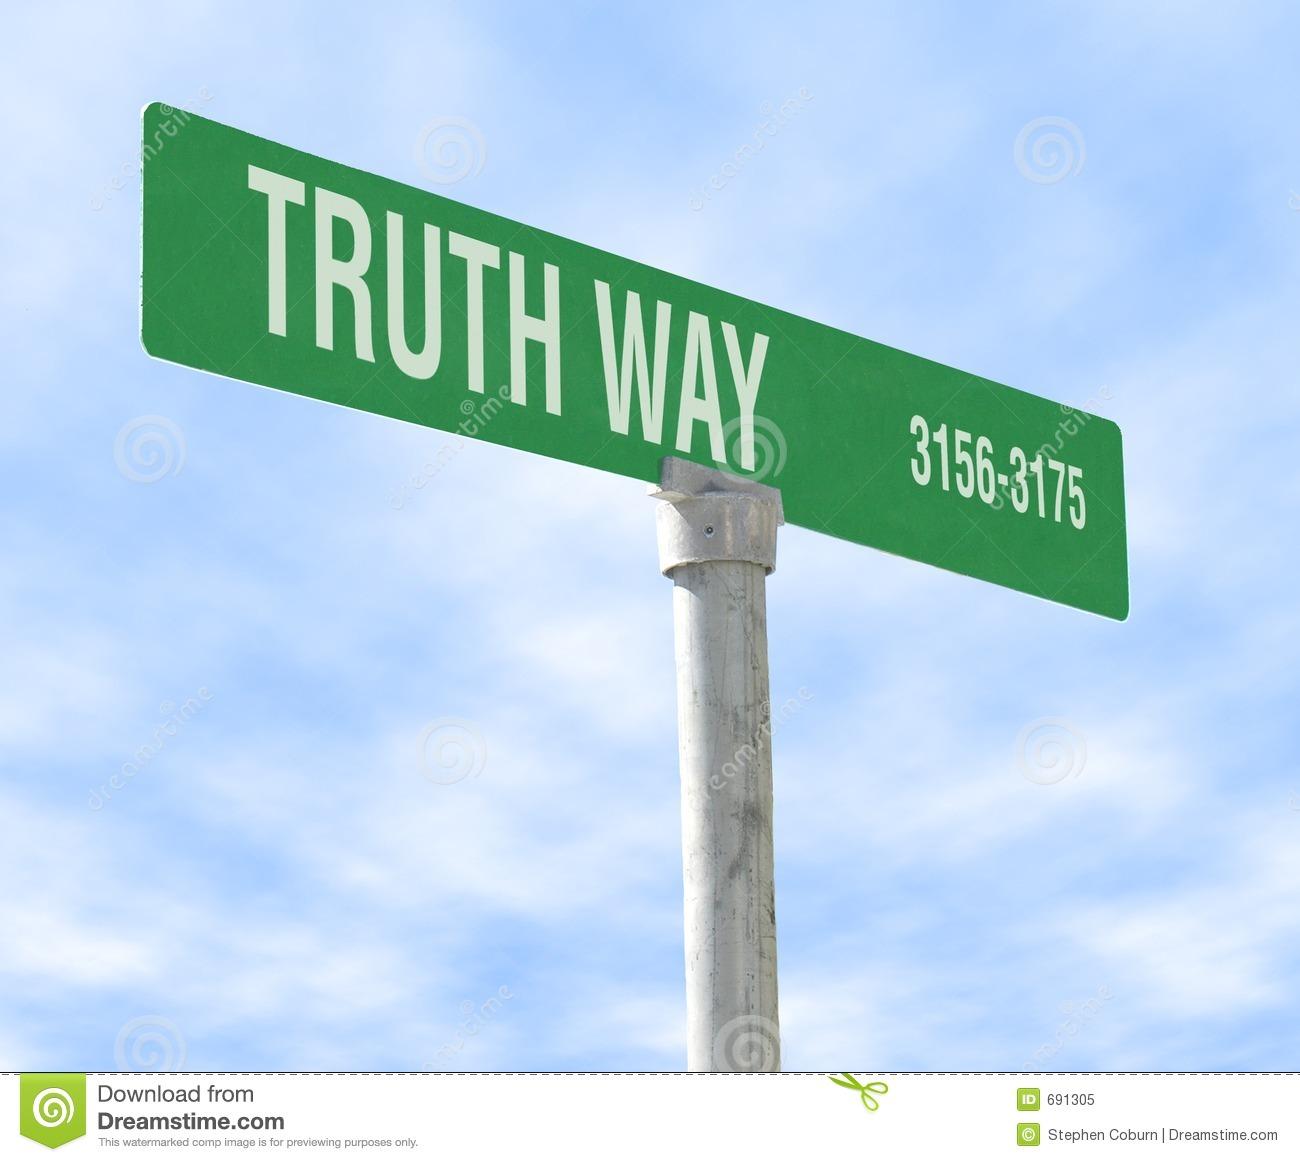 truth-way-691305.jpg